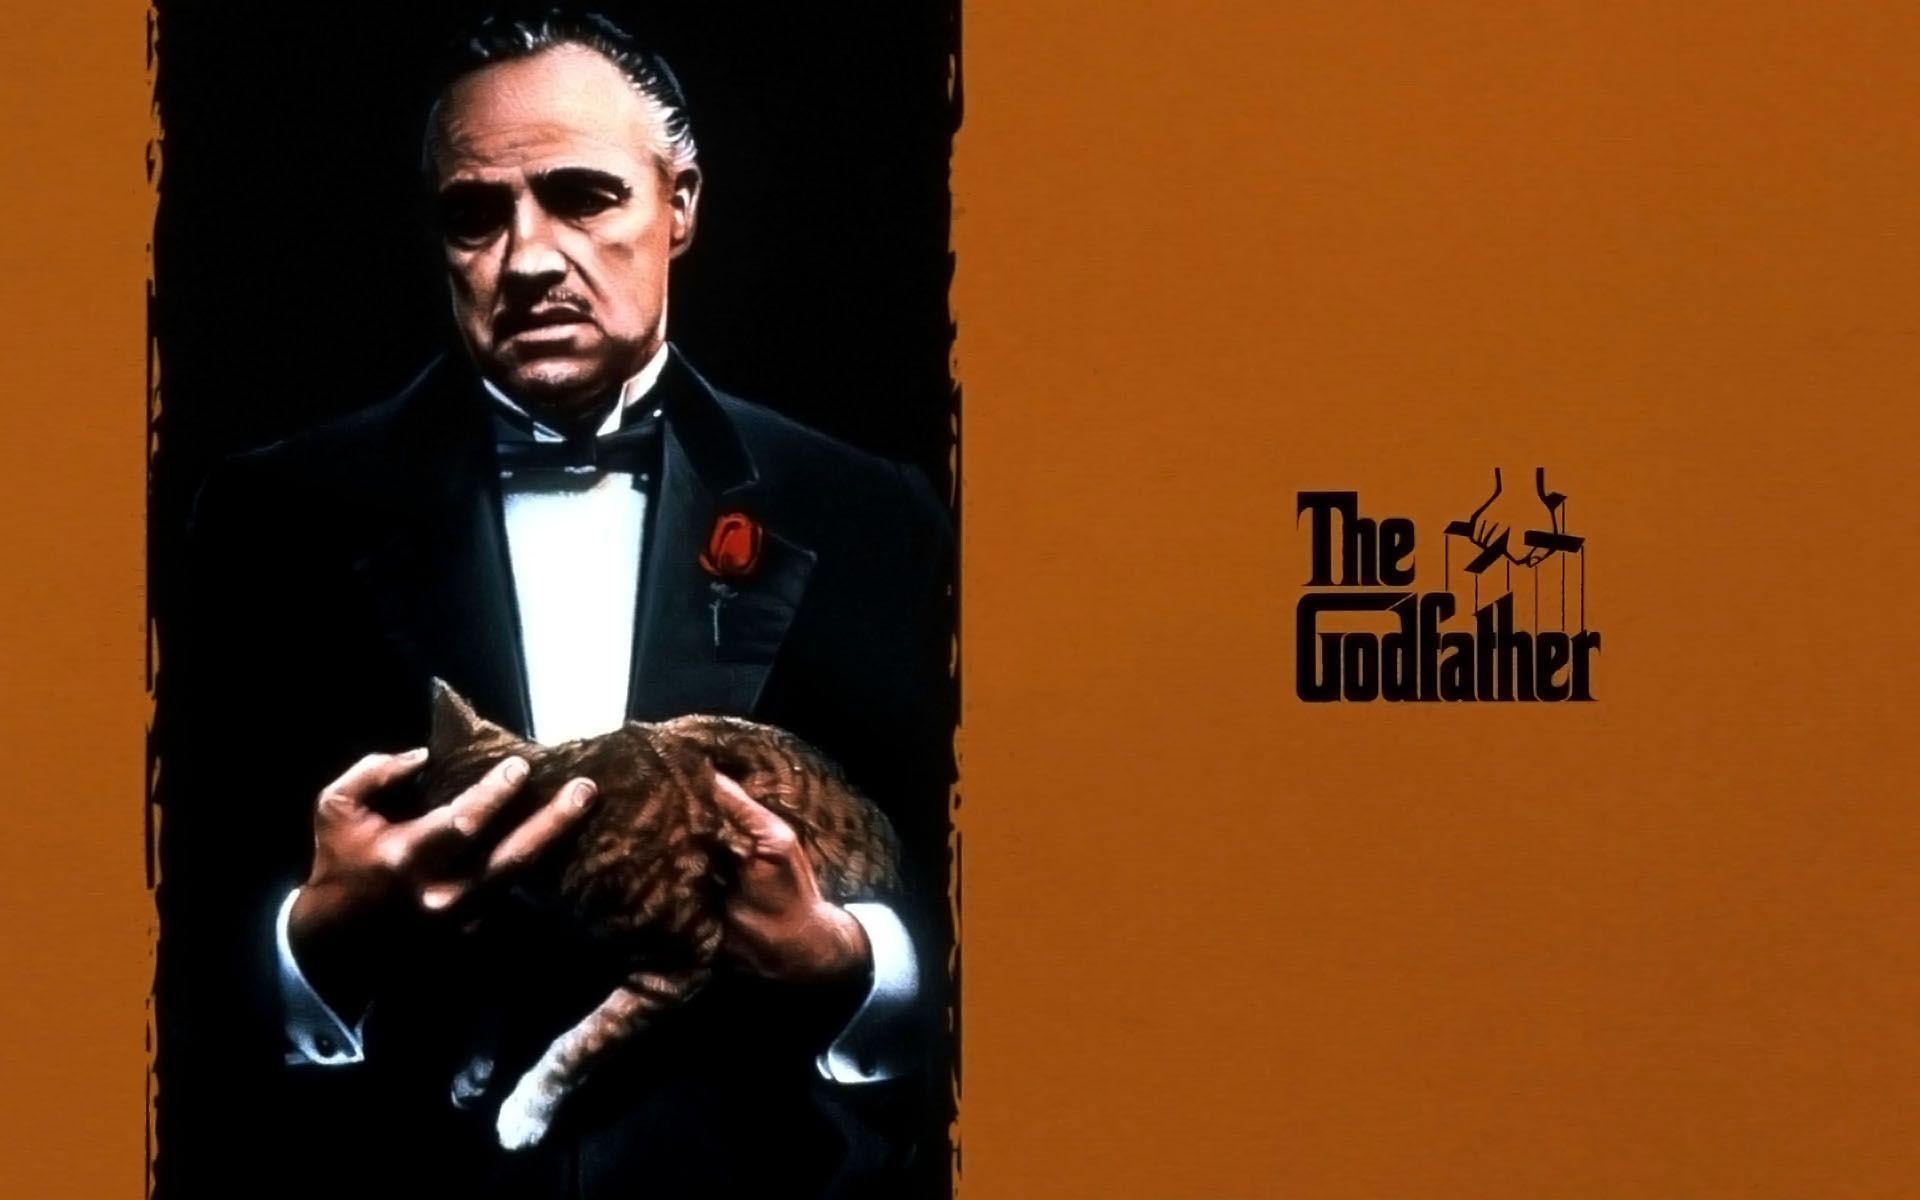 Godfather Movie Download For Desktop   Data-src /w/full/9/b/c/181709 - Godfather Movie - HD Wallpaper